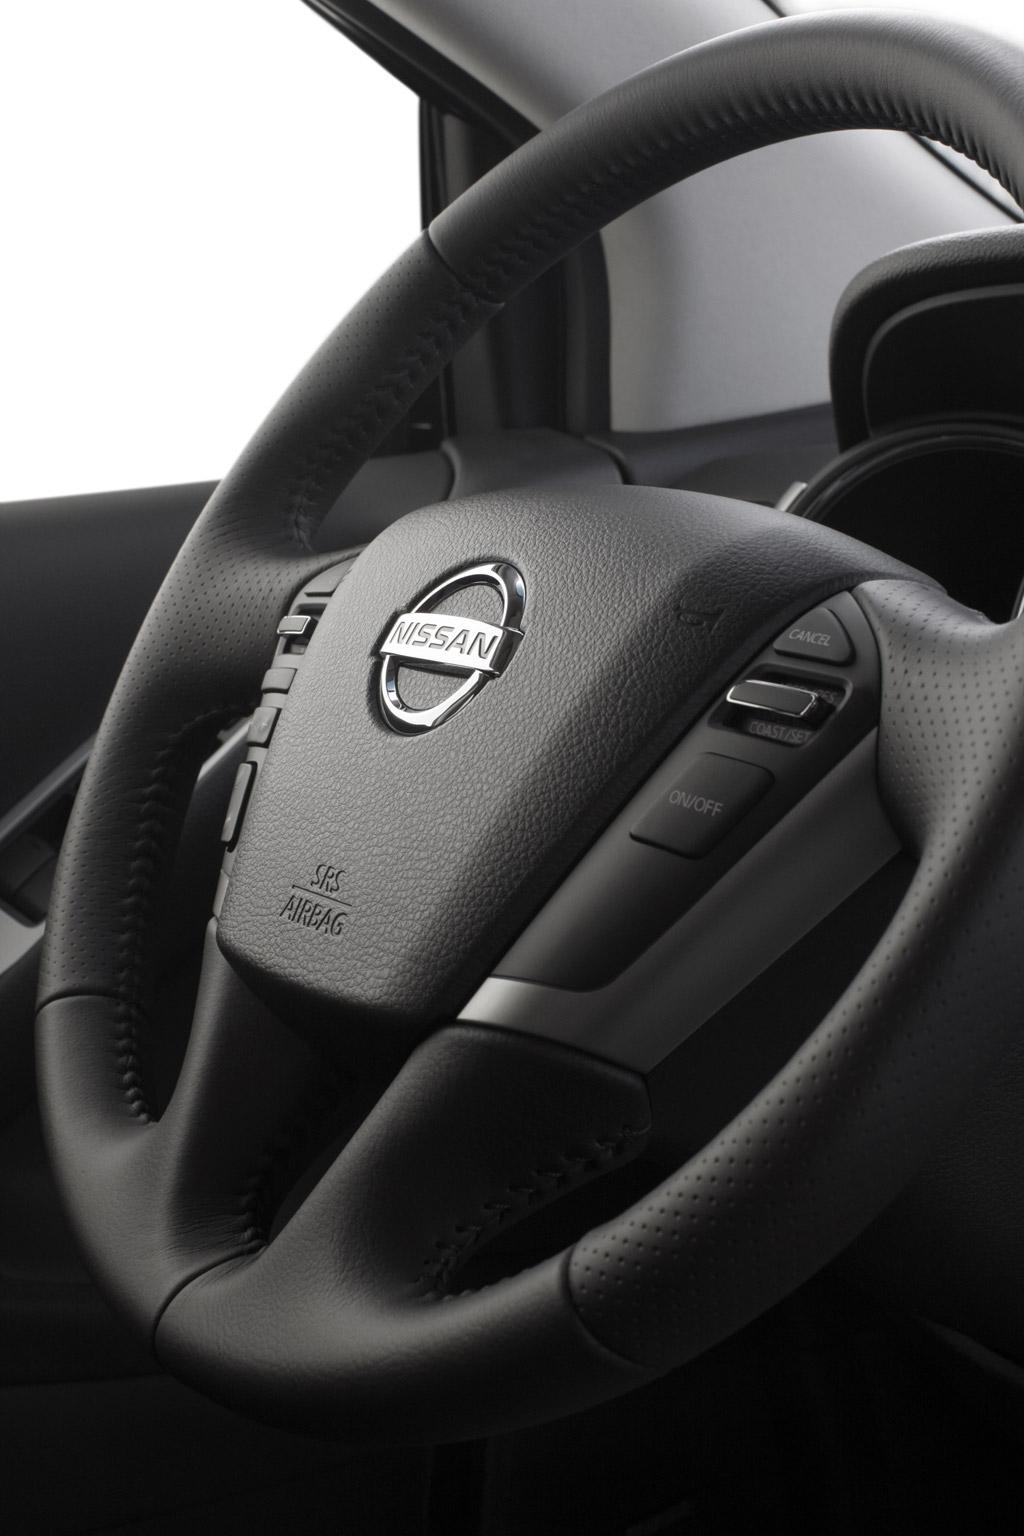 Nissan Murano Nissan Murano. Volante.